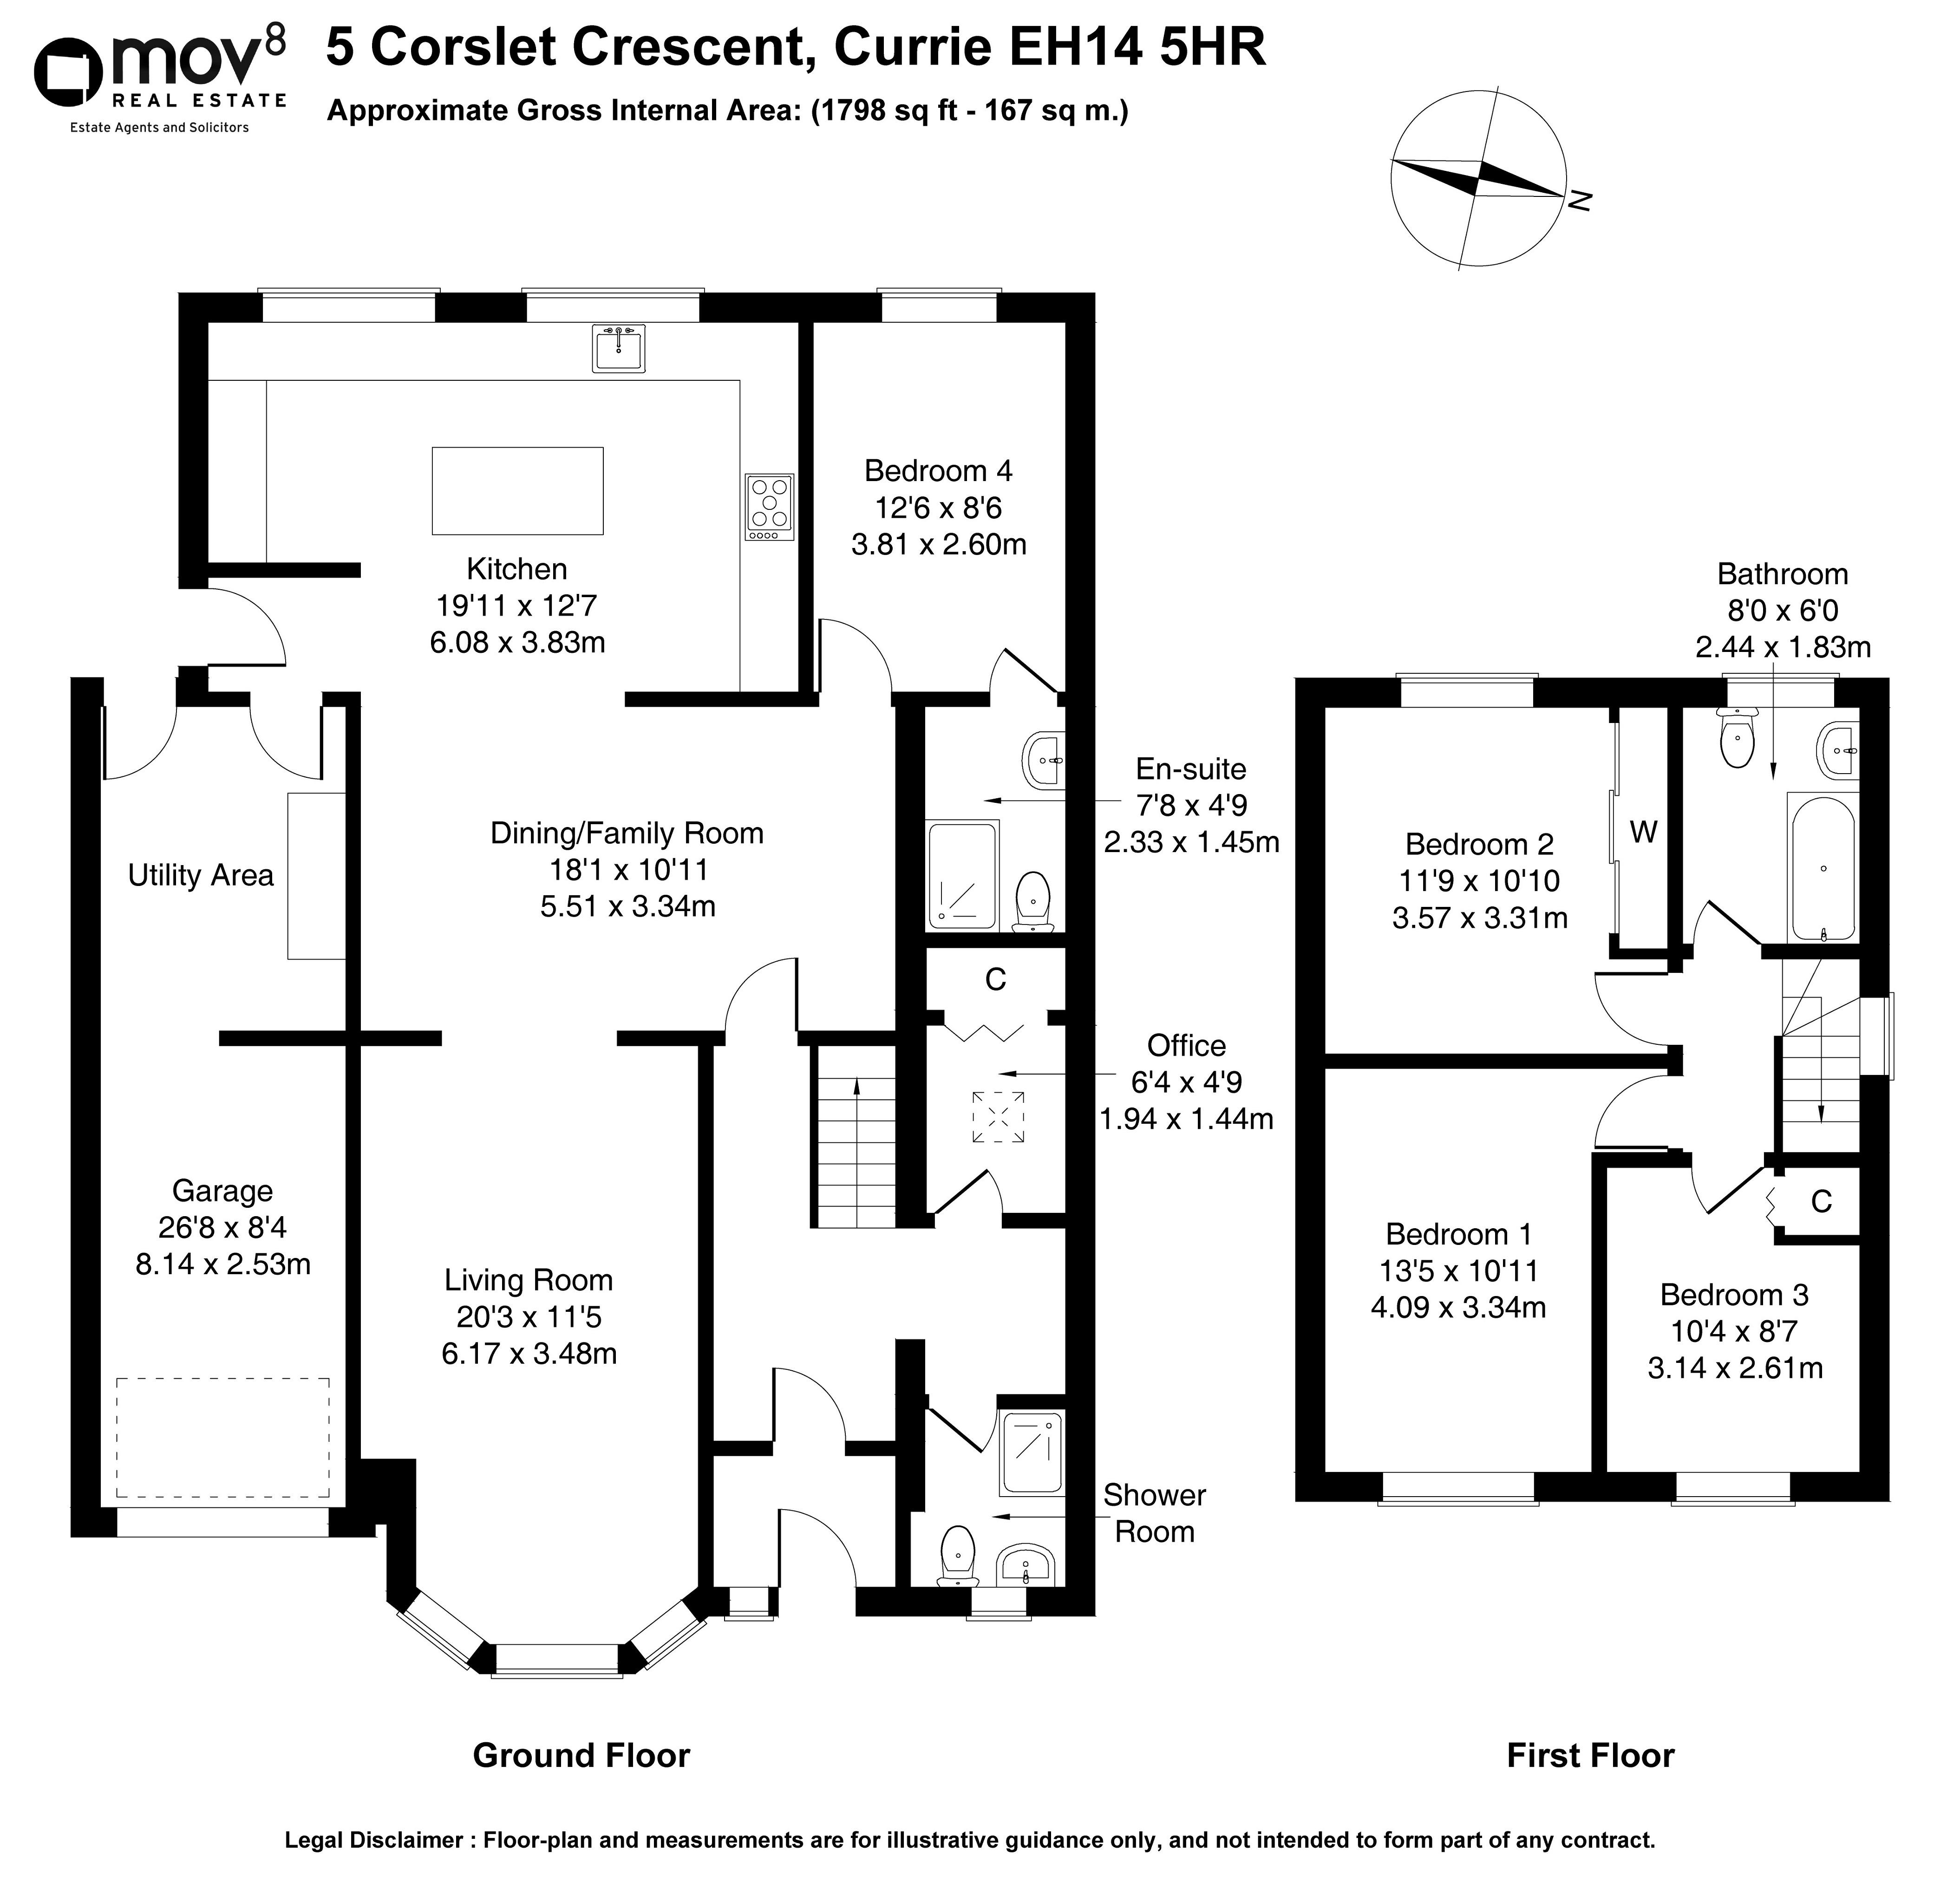 Floorplan 1 of 5 Corslet Crescent, Currie, City of Edinburgh, EH14 5HR